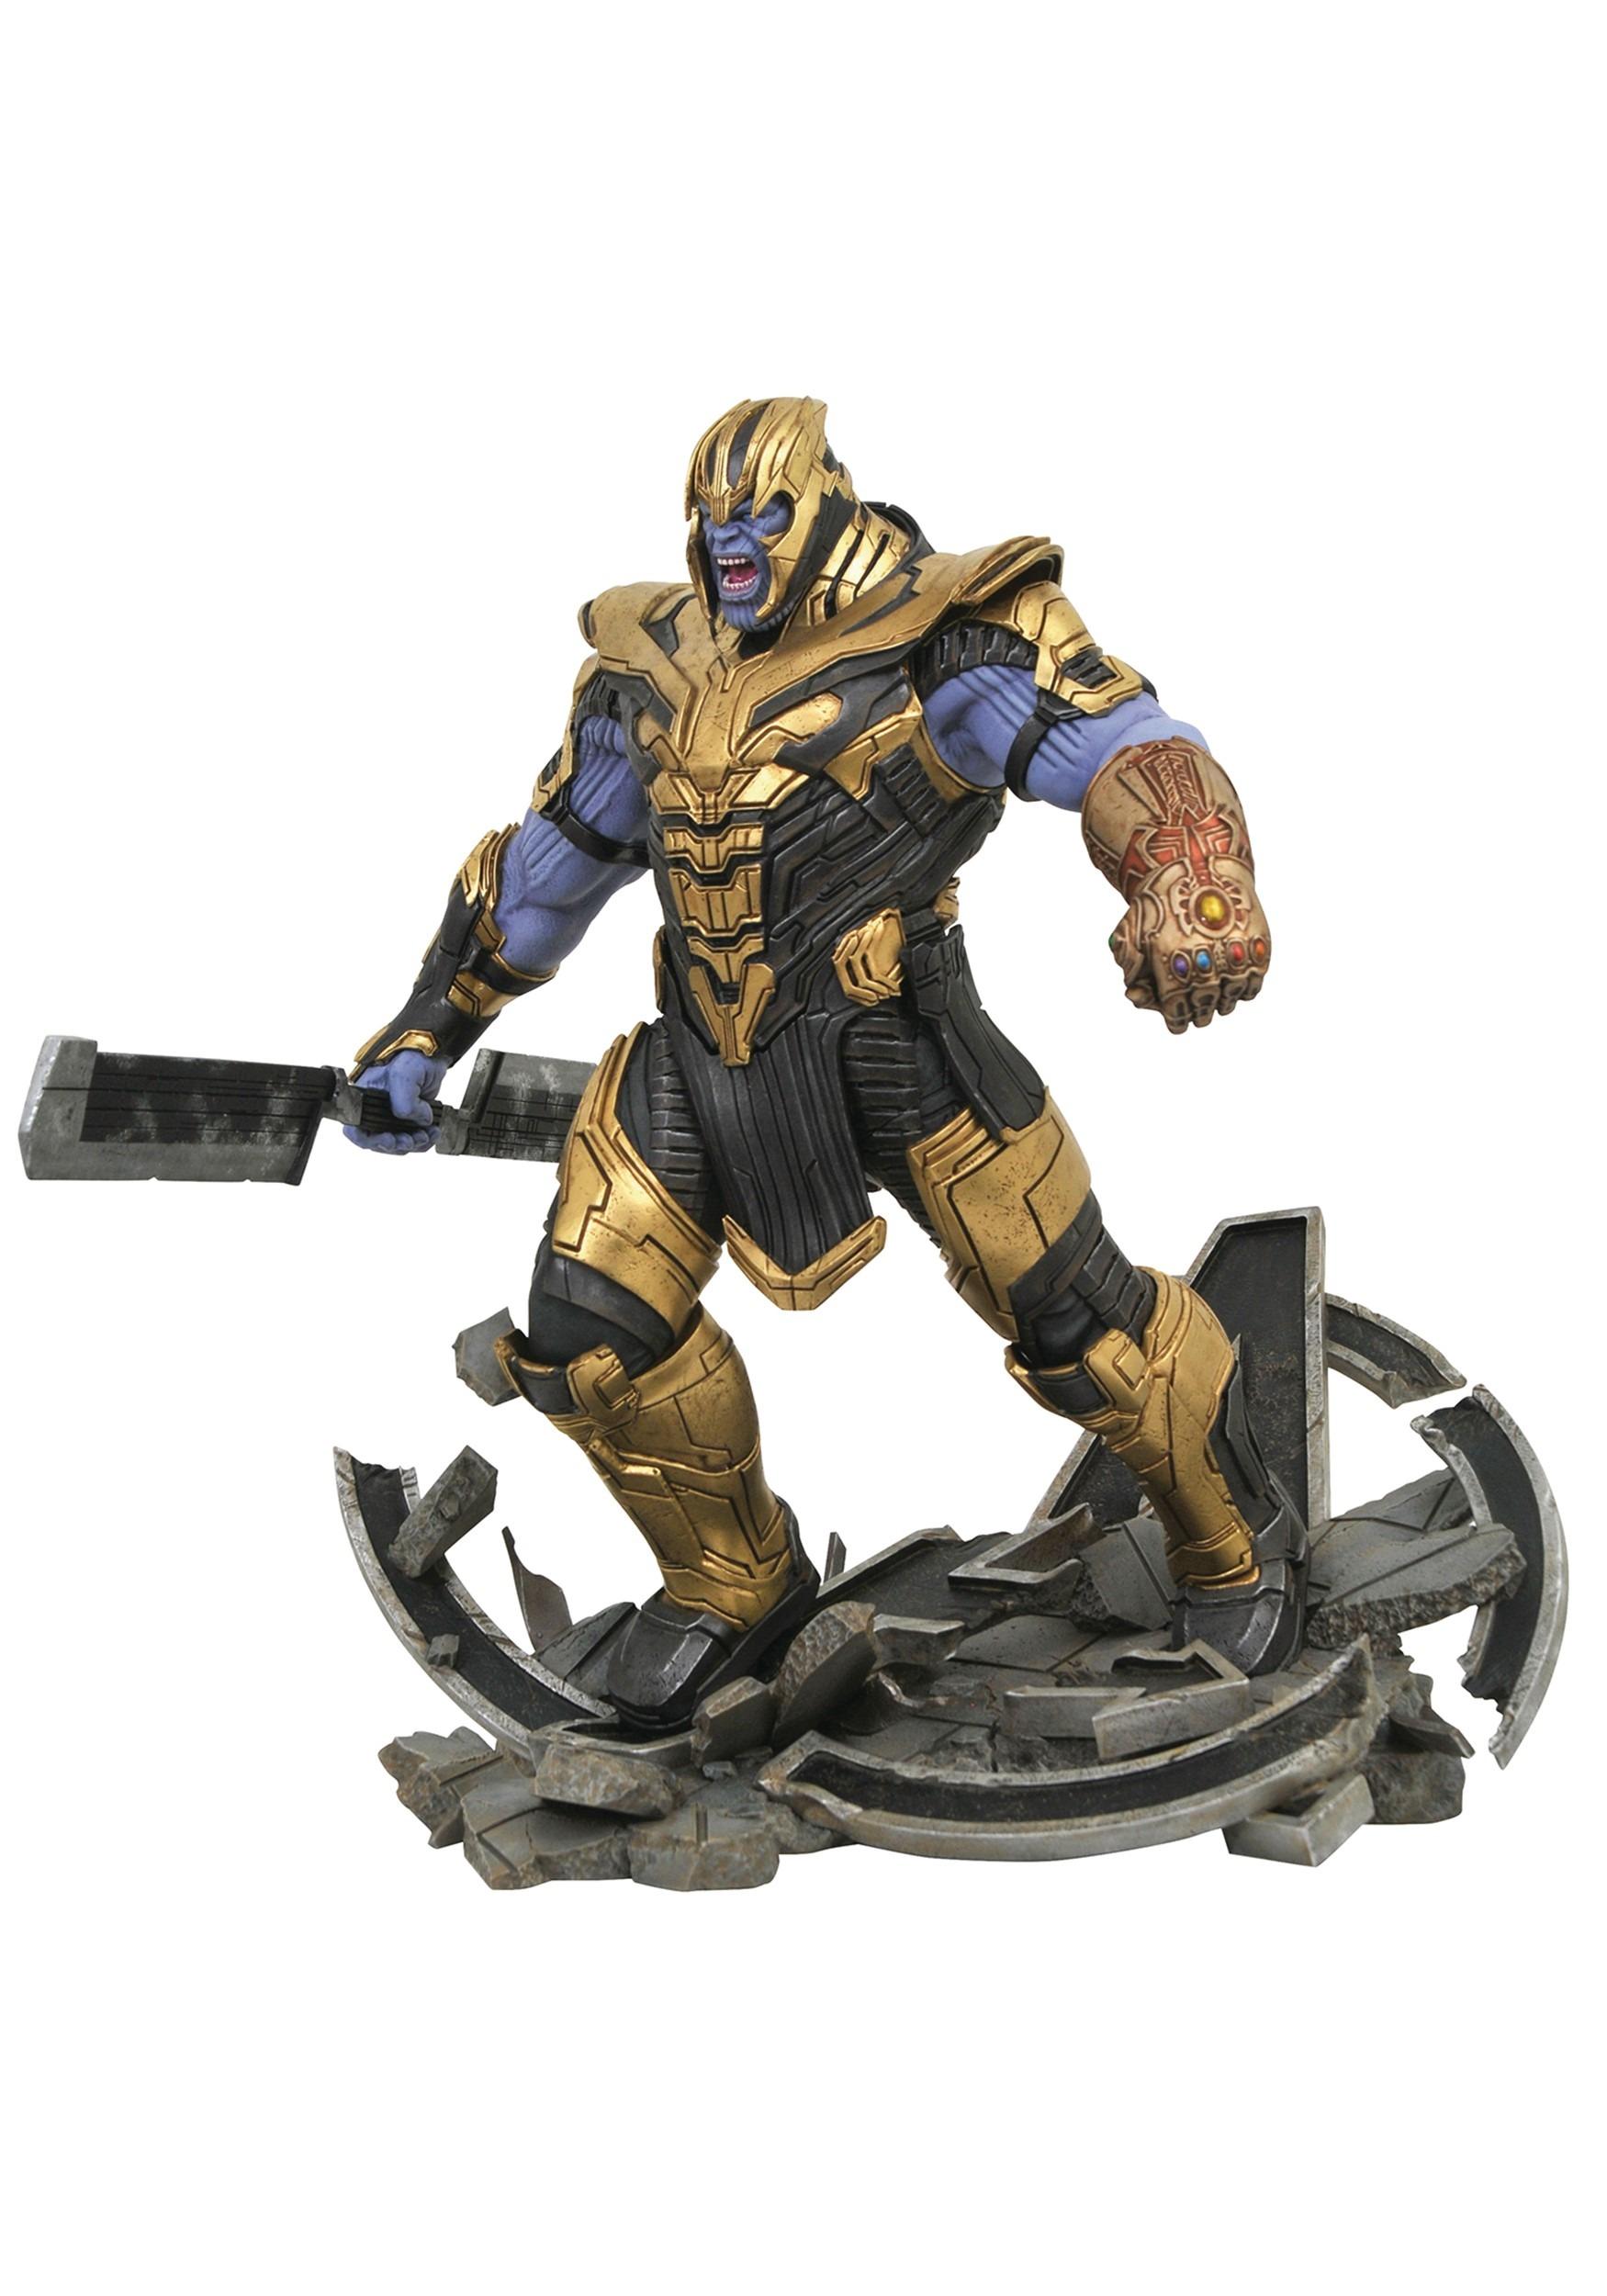 Marvel Milestones Avengers: Endgame Armored Thanos Figure